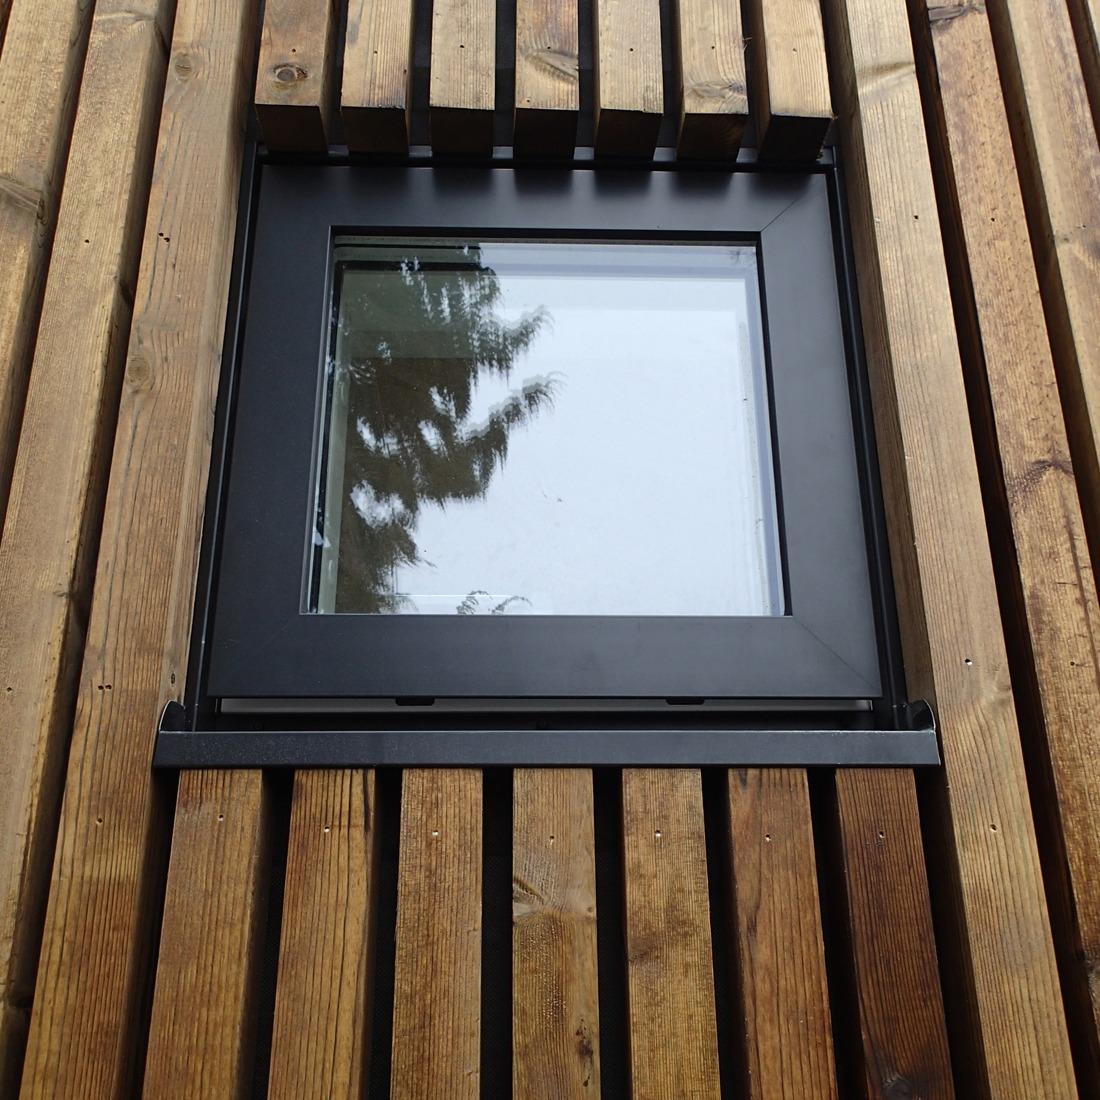 A 8.2 GÖ fönster 11 11 fk